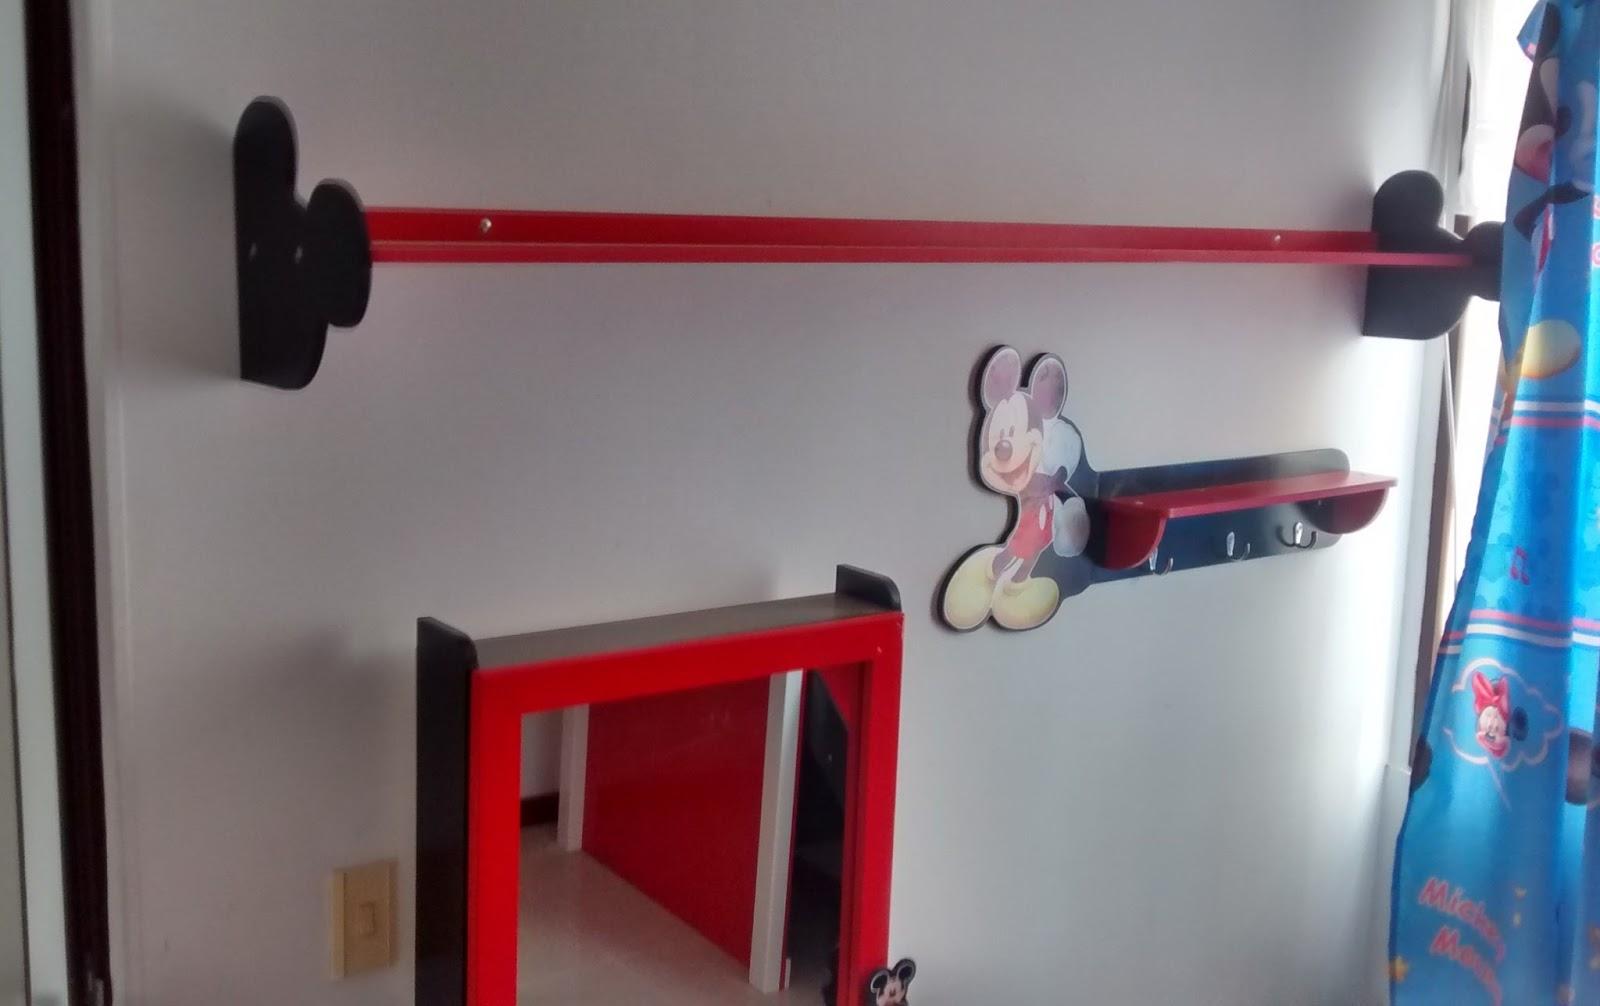 Galeria arte y dise o madekids set habitacion infantil - Muebles de mickey mouse ...